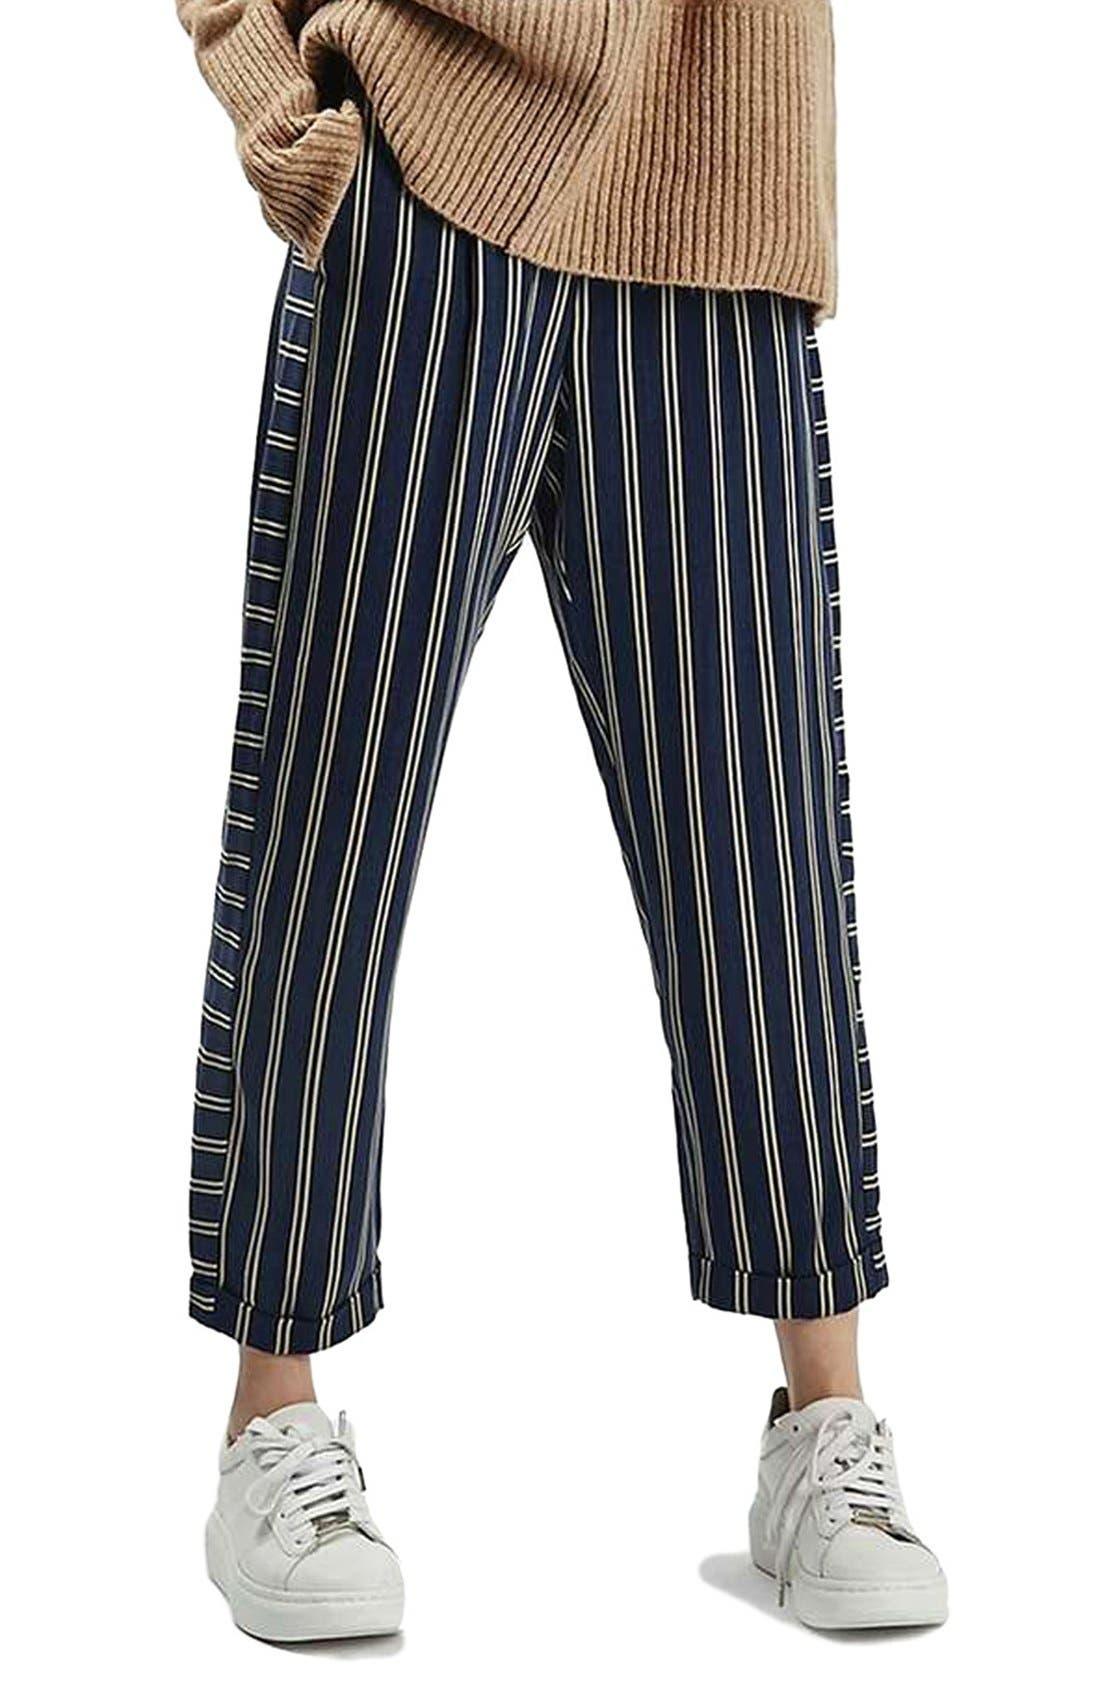 Alternate Image 1 Selected - Topshop Stripe Peg Trousers